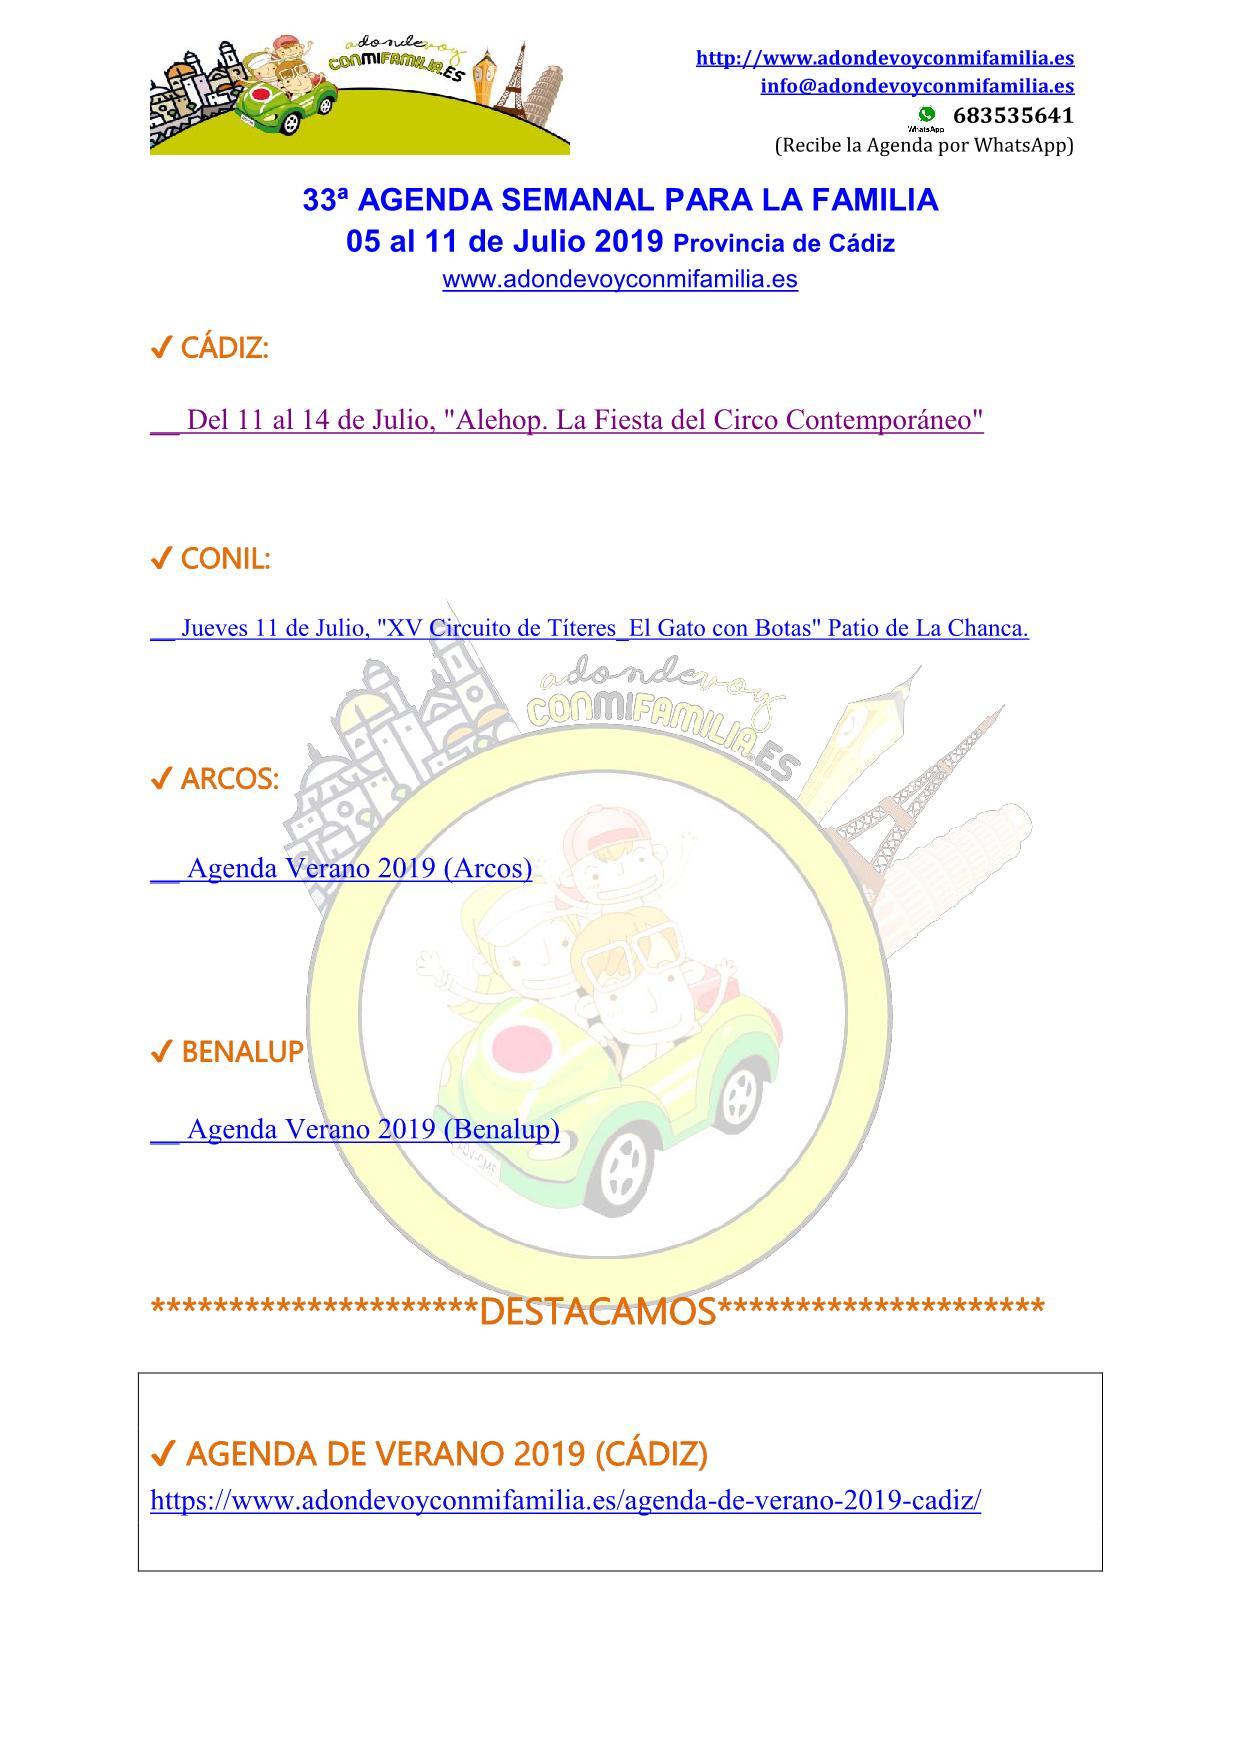 033 Agenda semanal familiar 05 al 11 Julio 2019